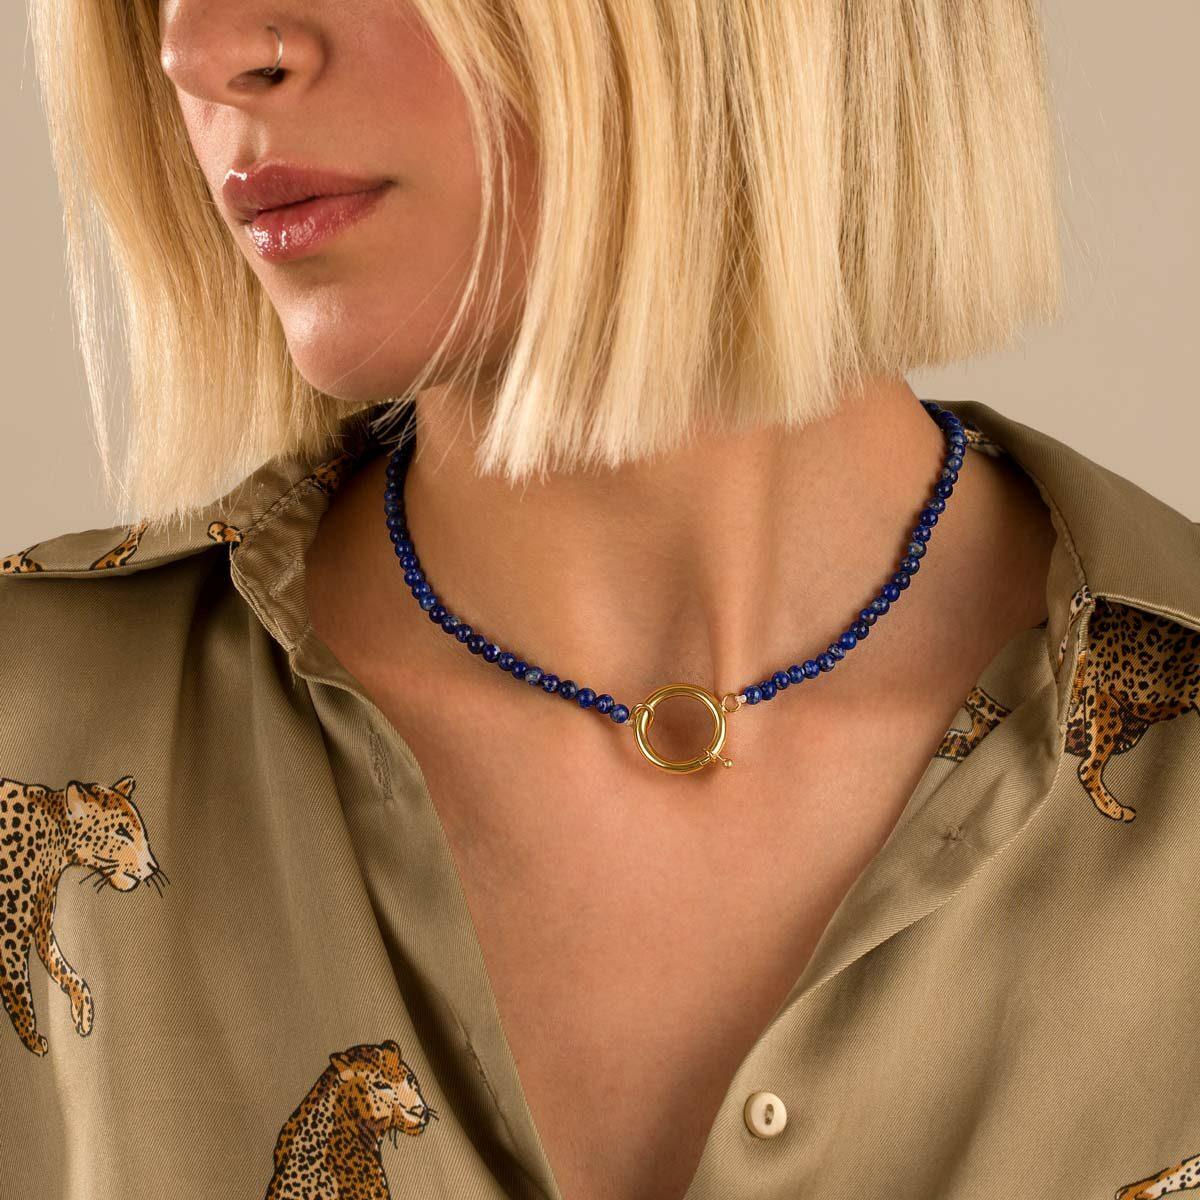 گردنبند طلا سنگی قفل دایره و لاجورد